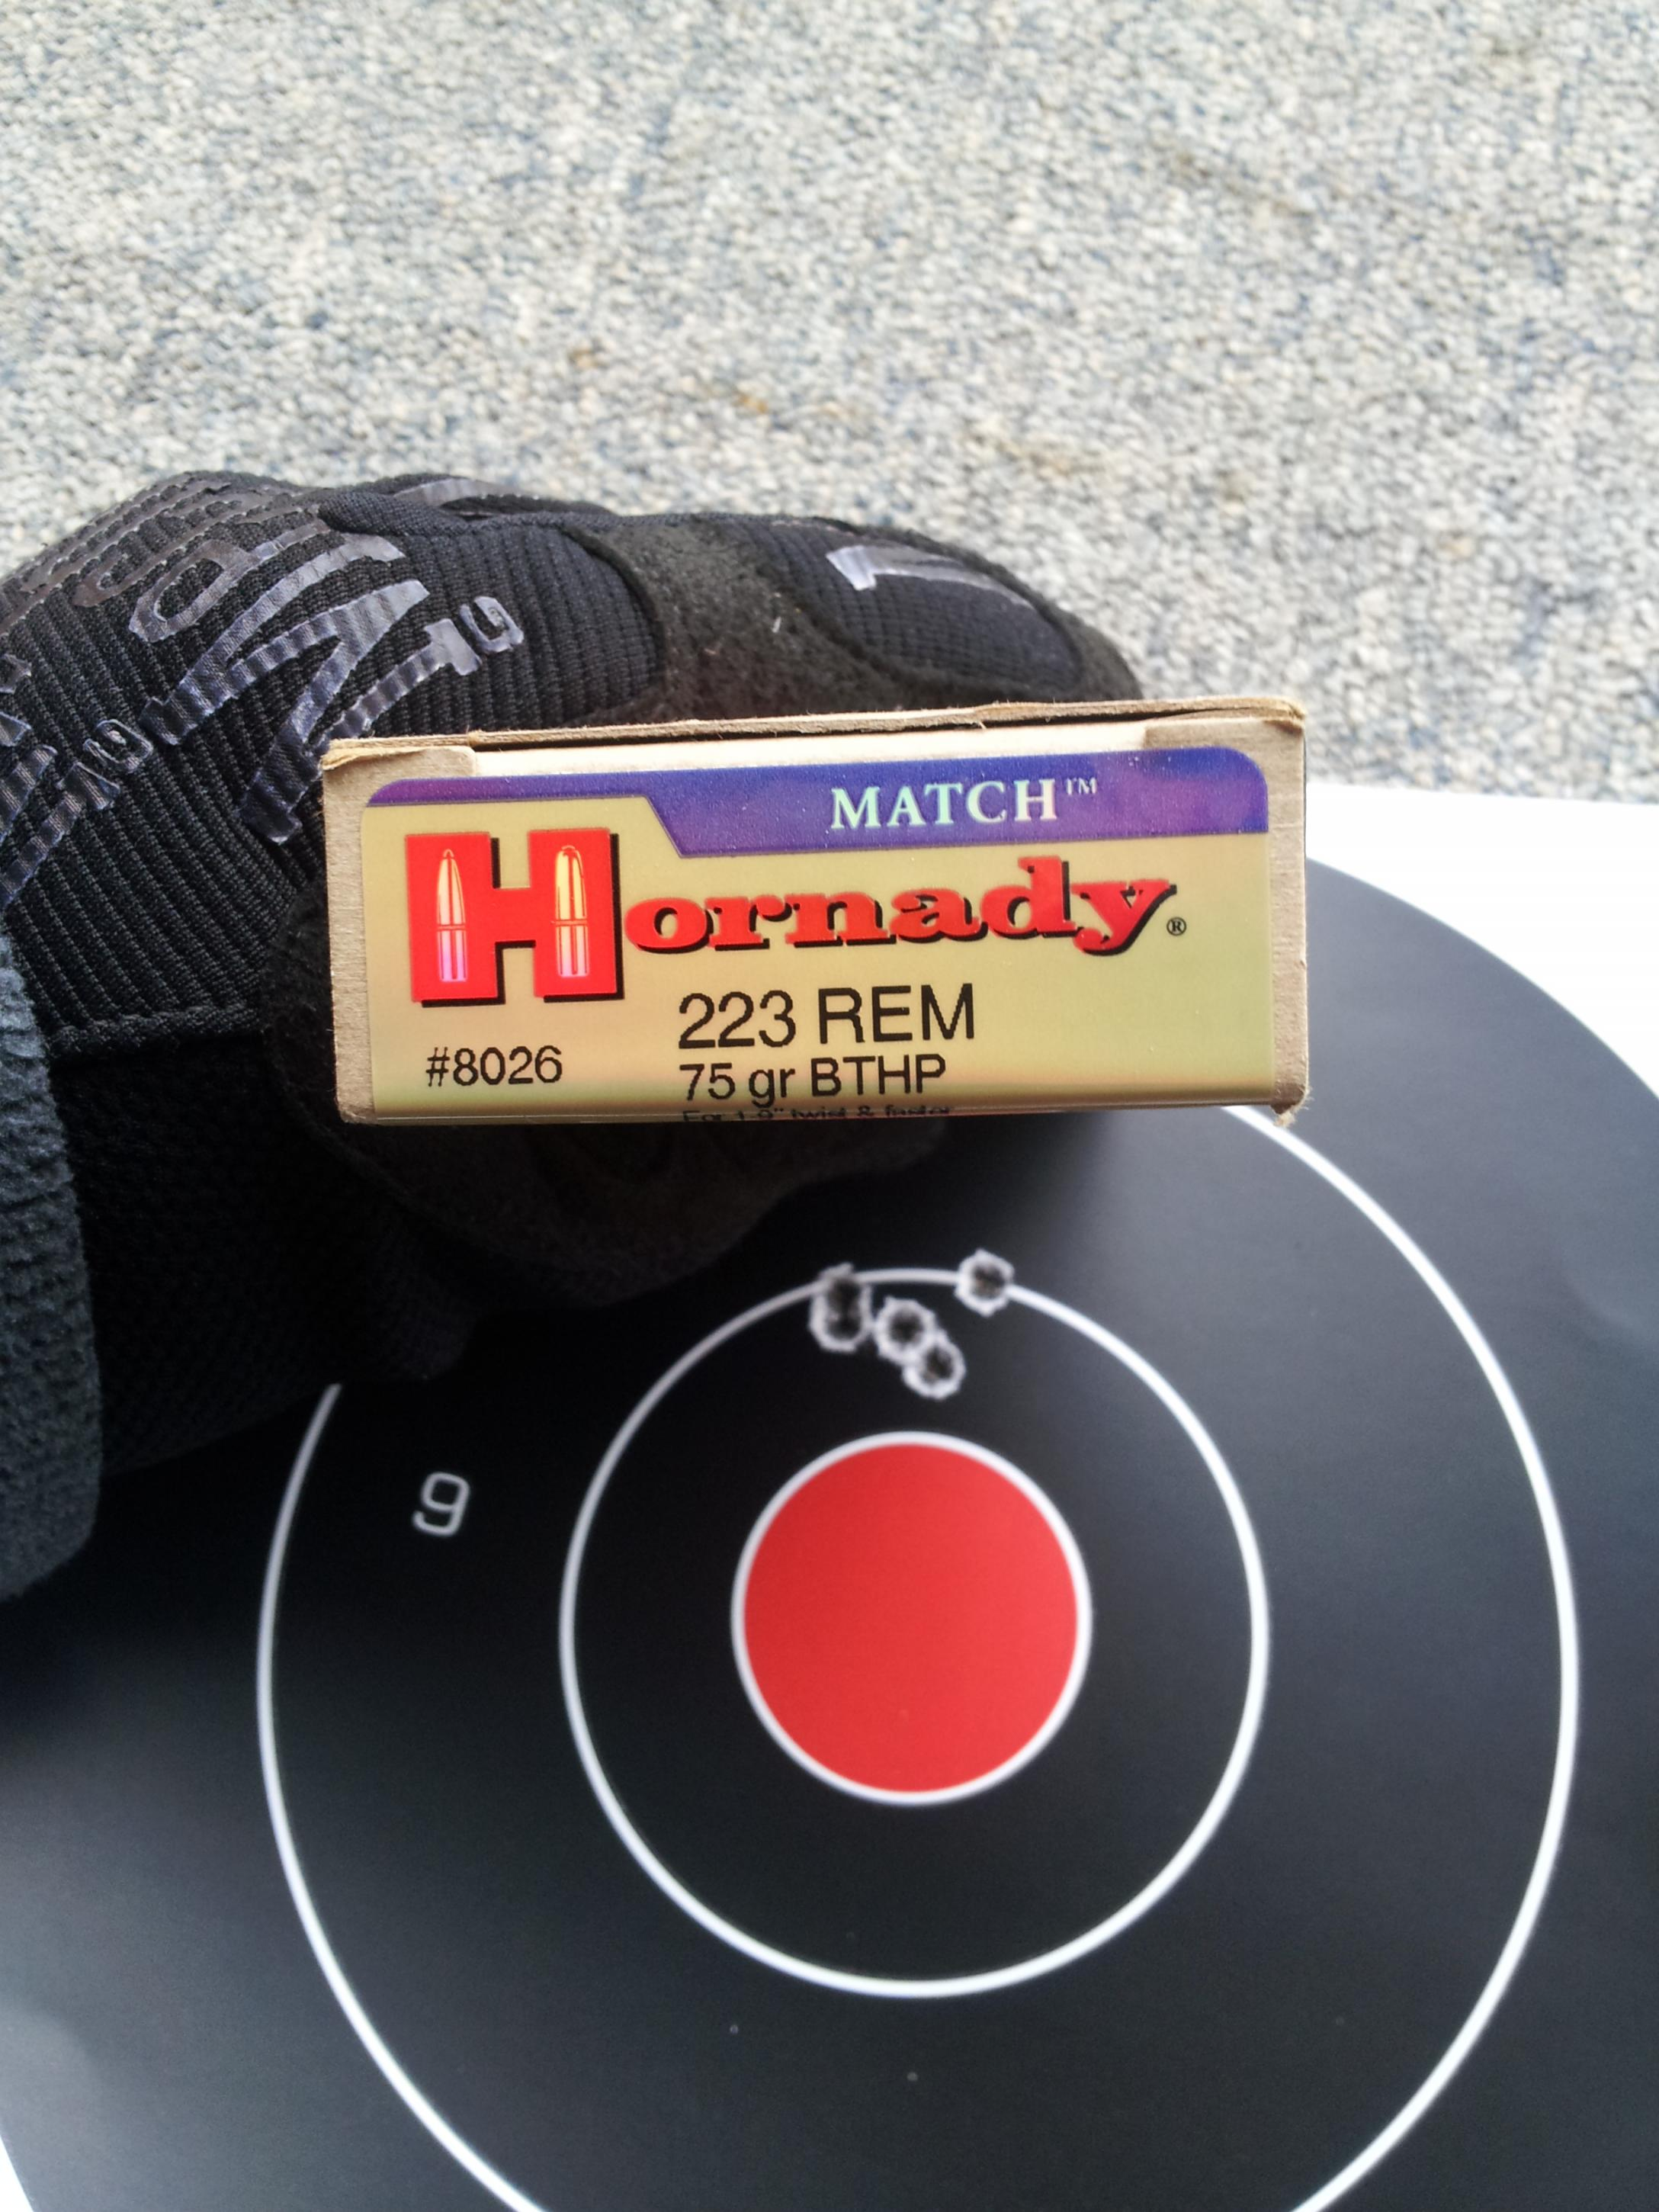 Troy Defense 5.56 Carbine-20121112_143836.jpg